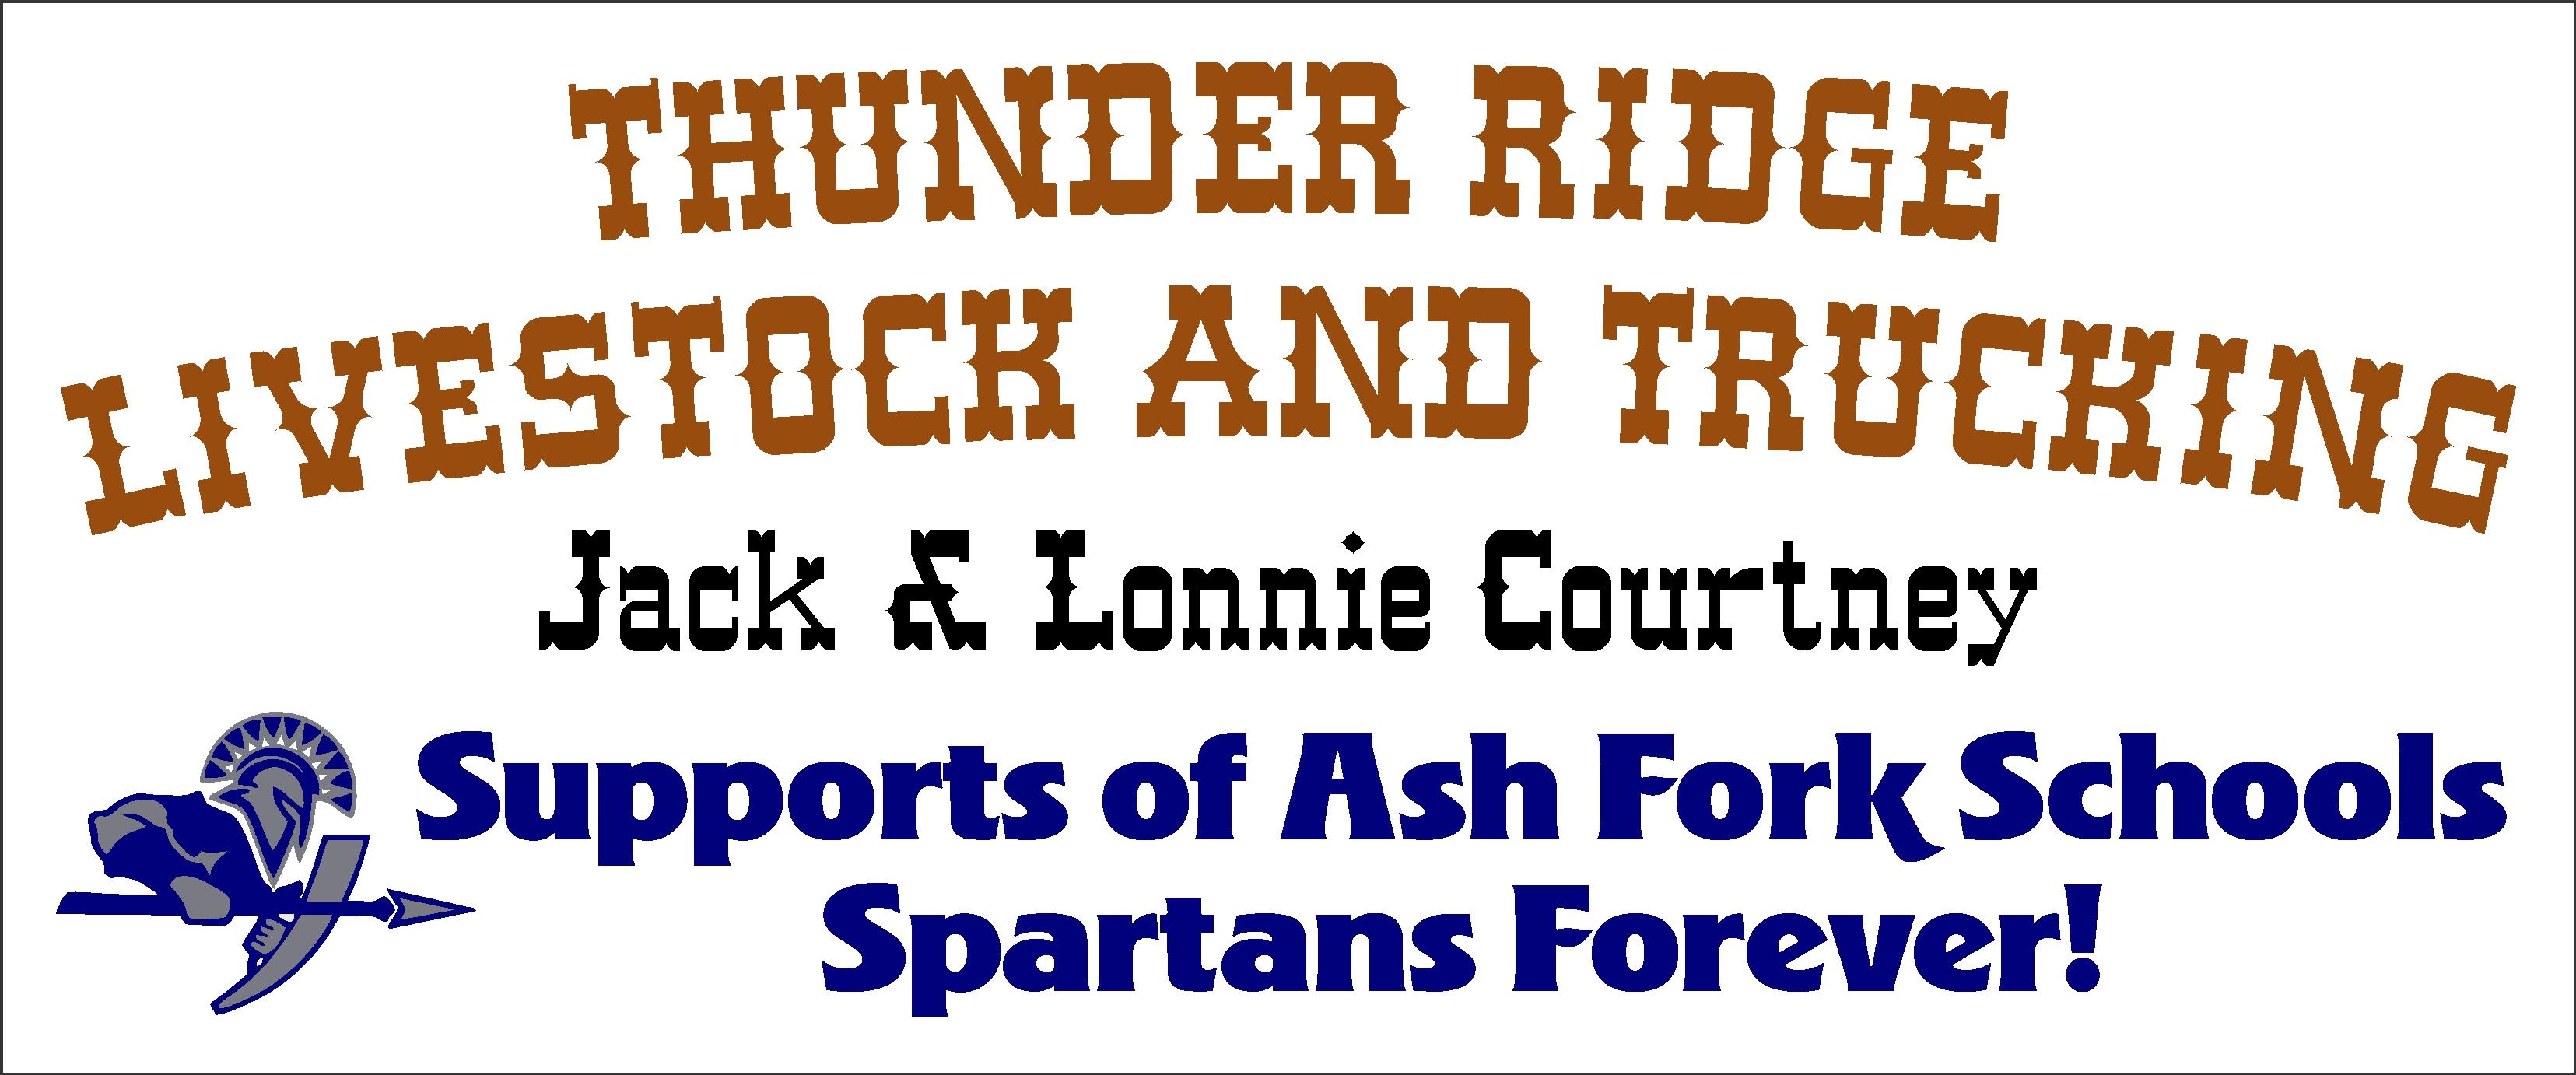 Thunder Ridge logo picture